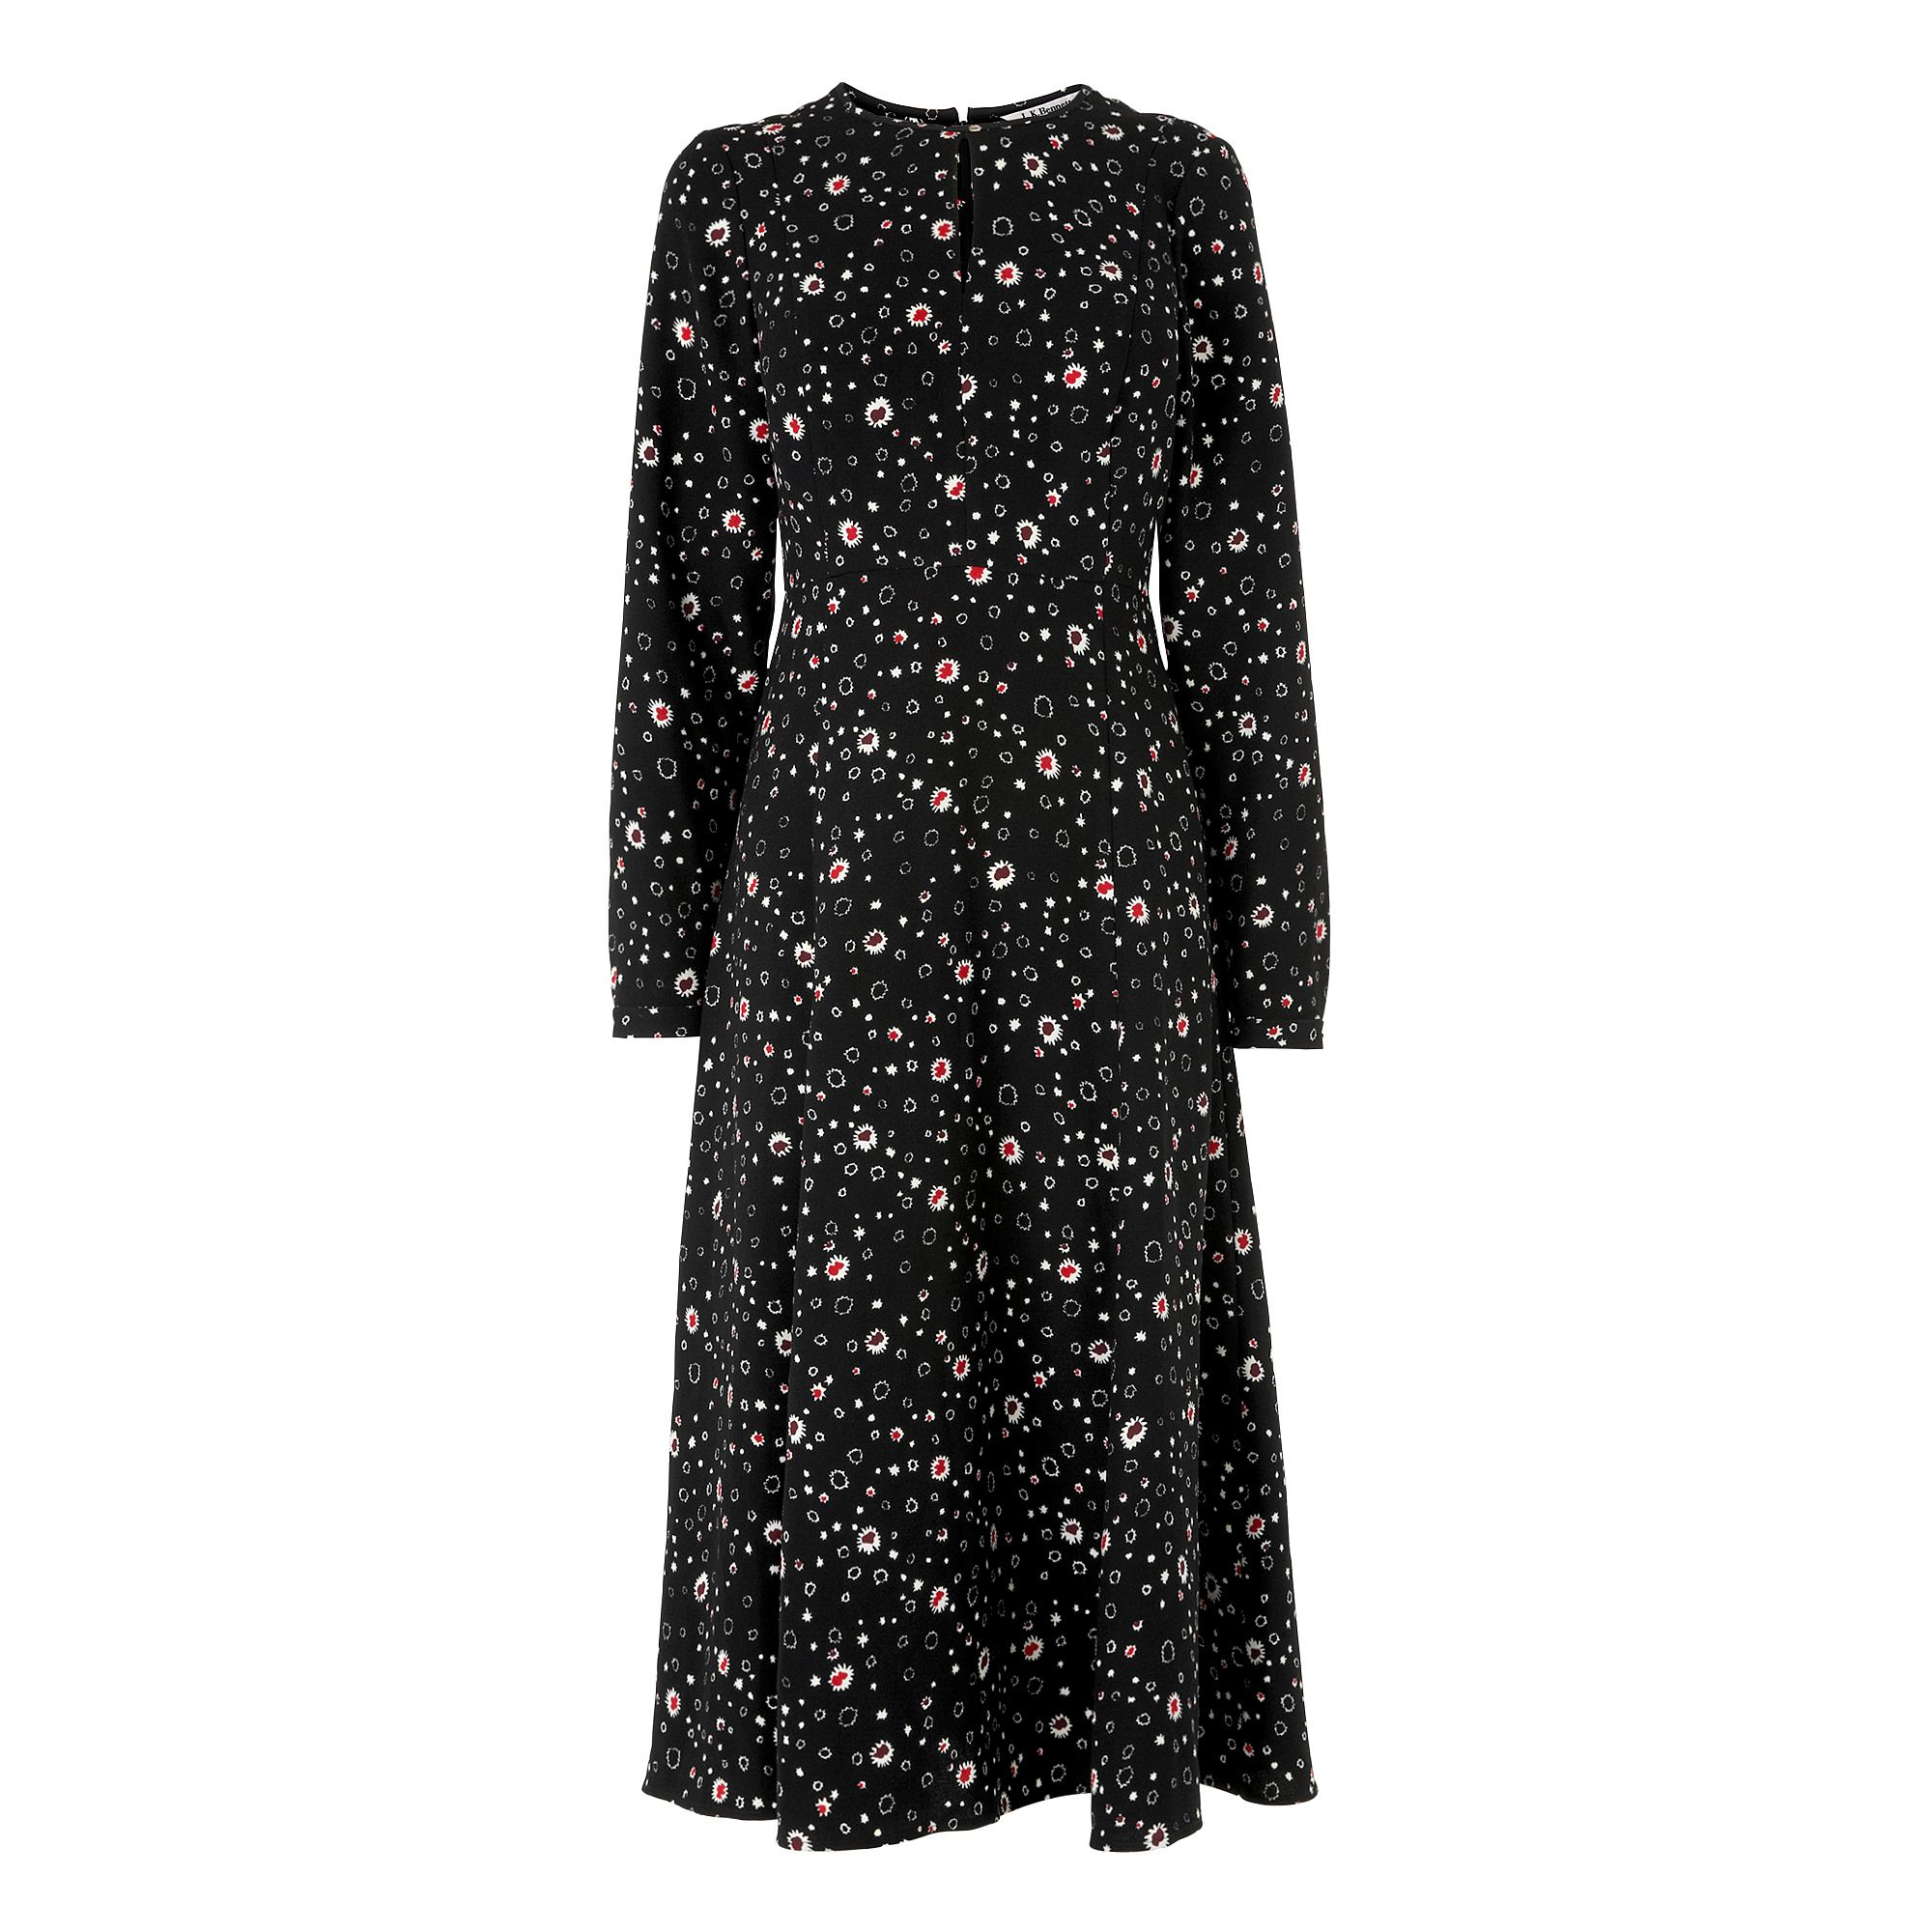 7e4f6801c9e2 Freya Black Printed Dress | Clothing | Collections | L.K.Bennett, London